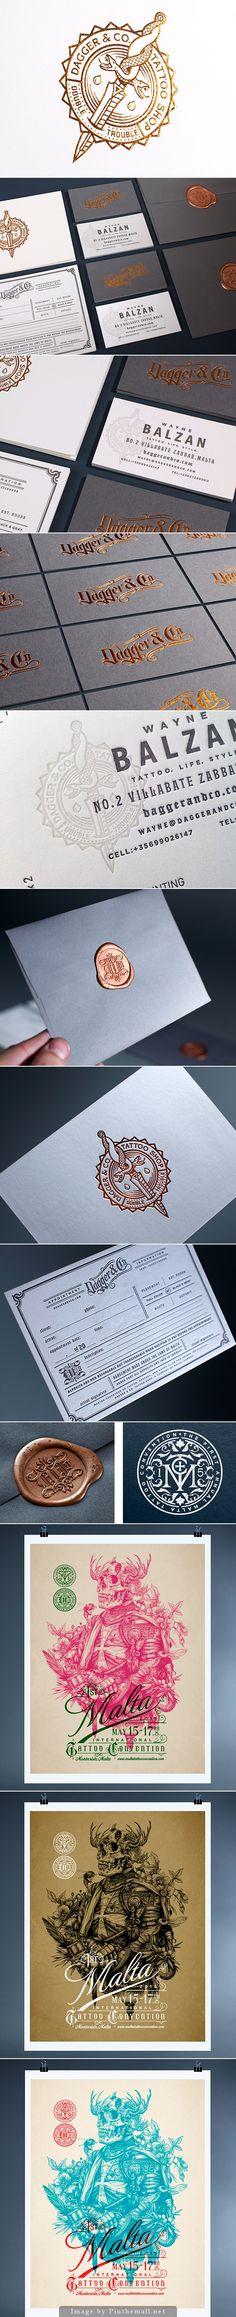 Dagger & Co.  amazing identity by Chad Michael